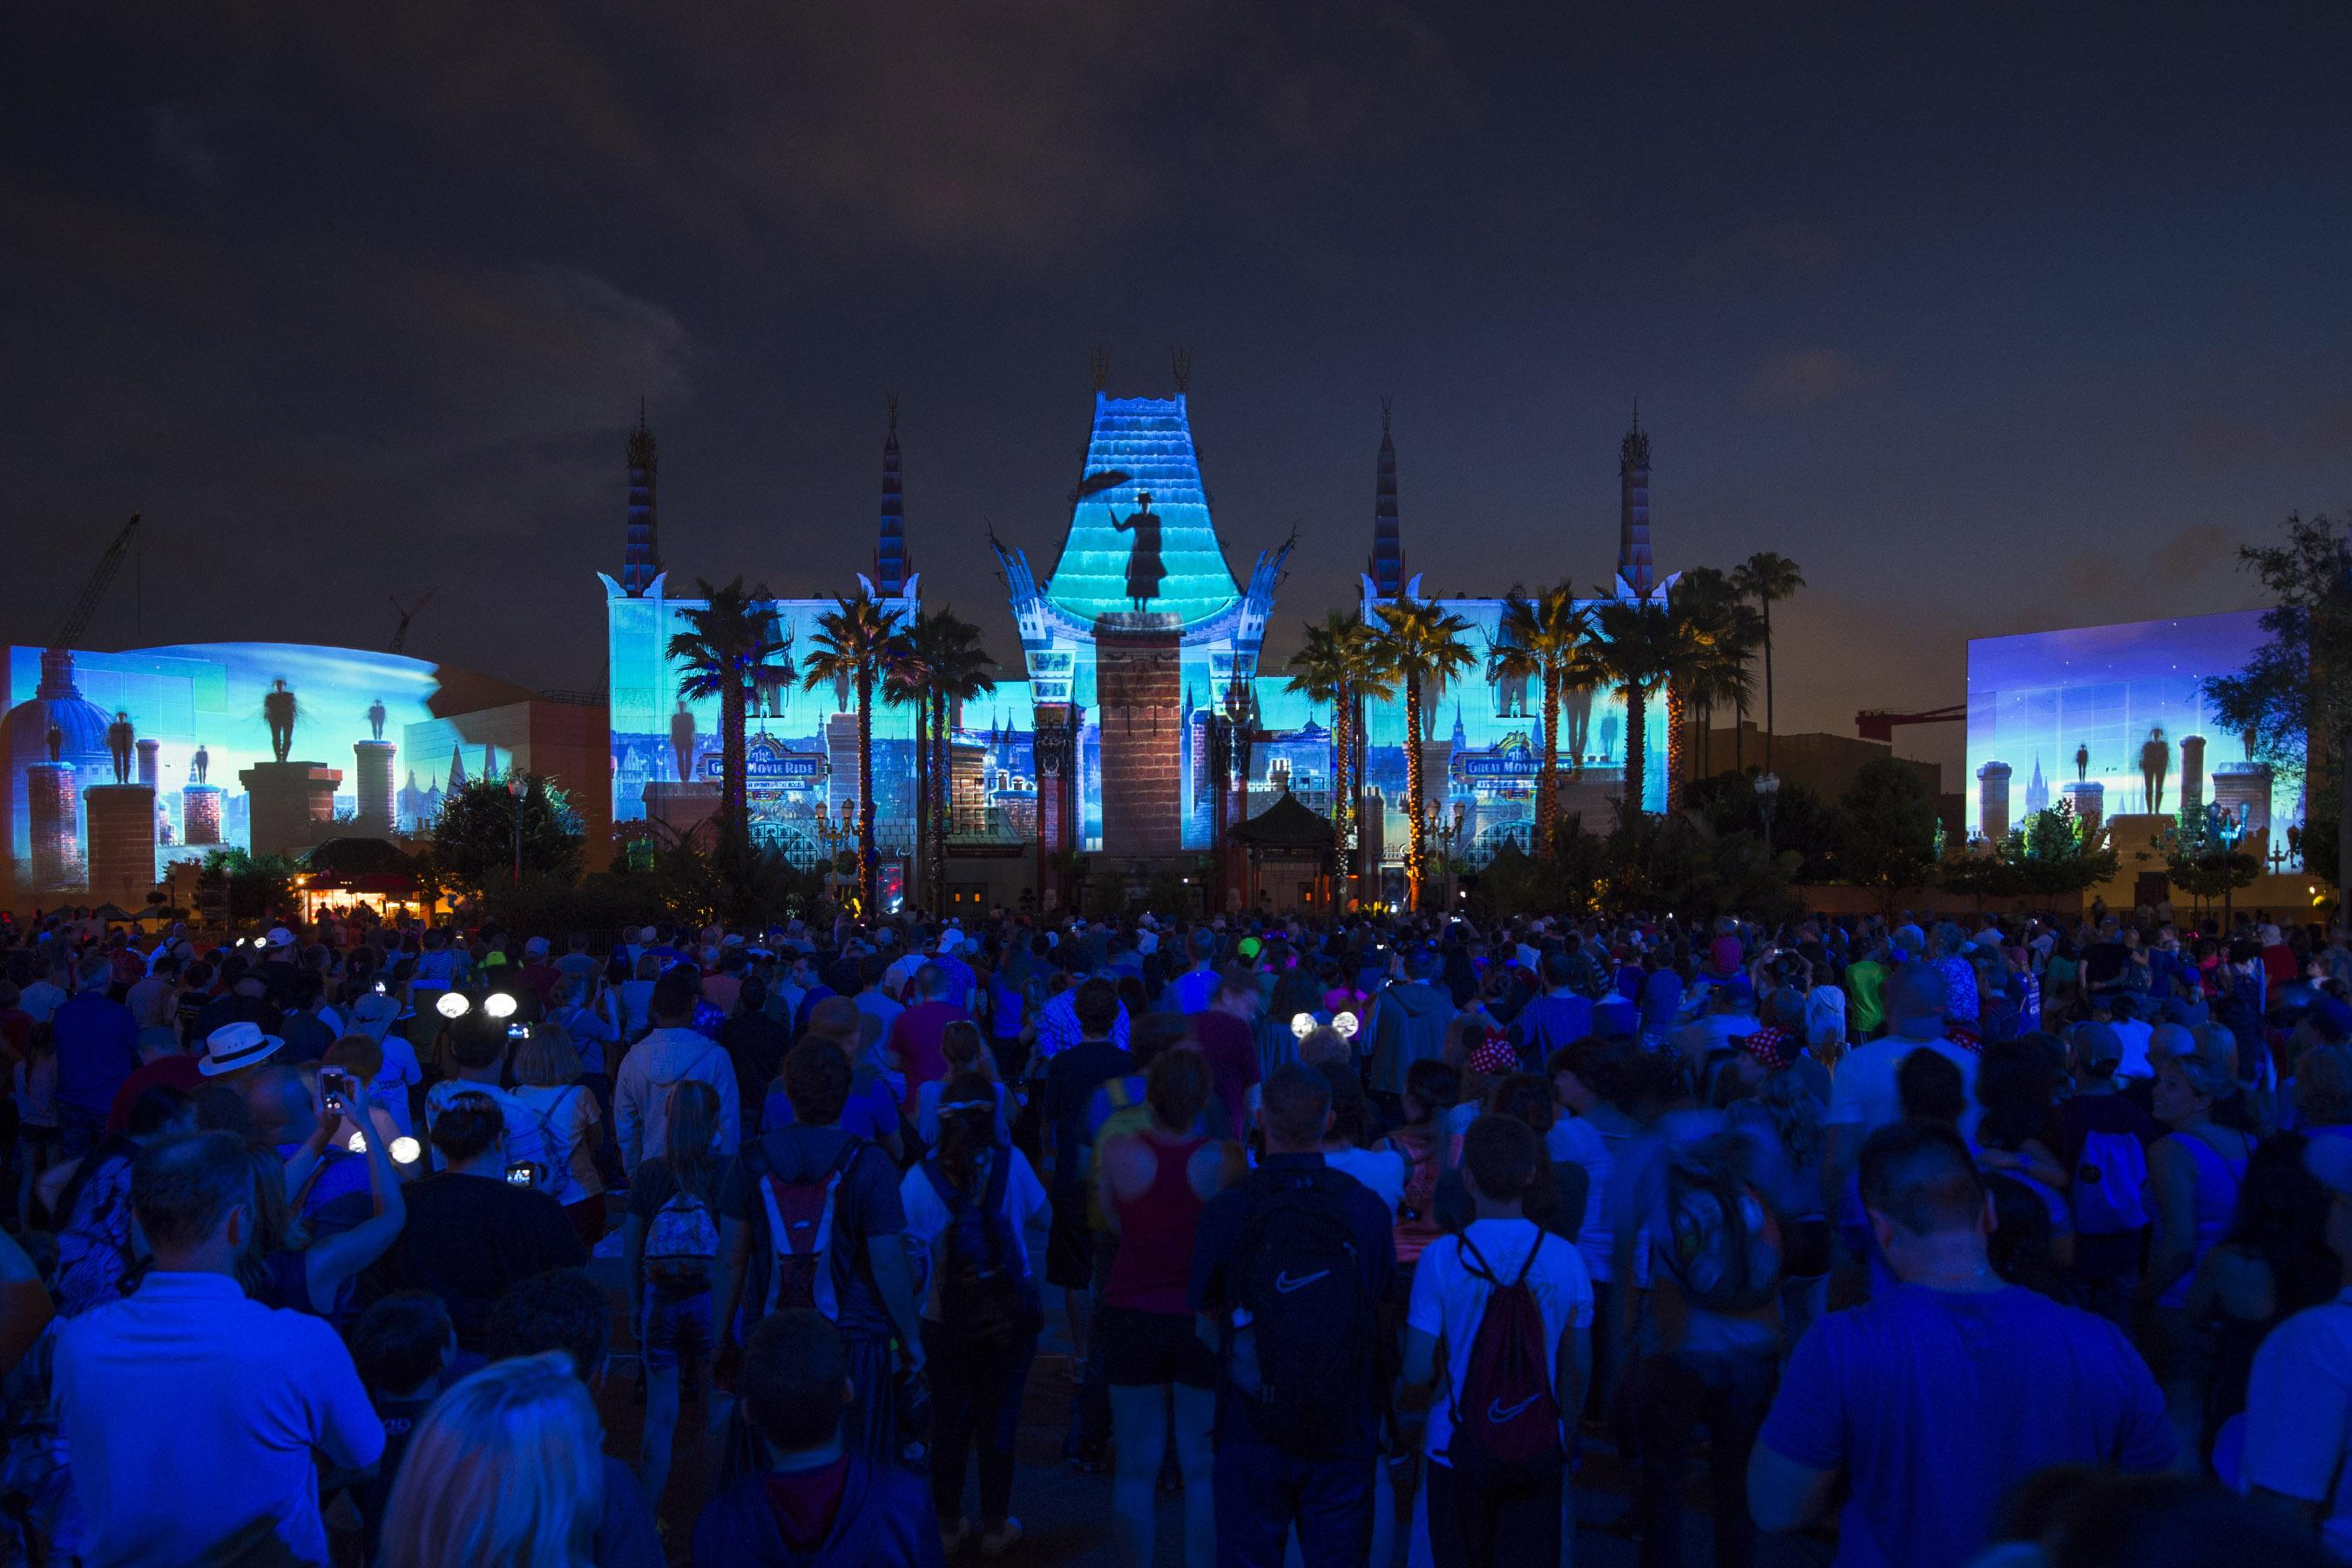 New Nighttime Entertainment at Disney's Hollywood Studios Celebrates Decades of Film